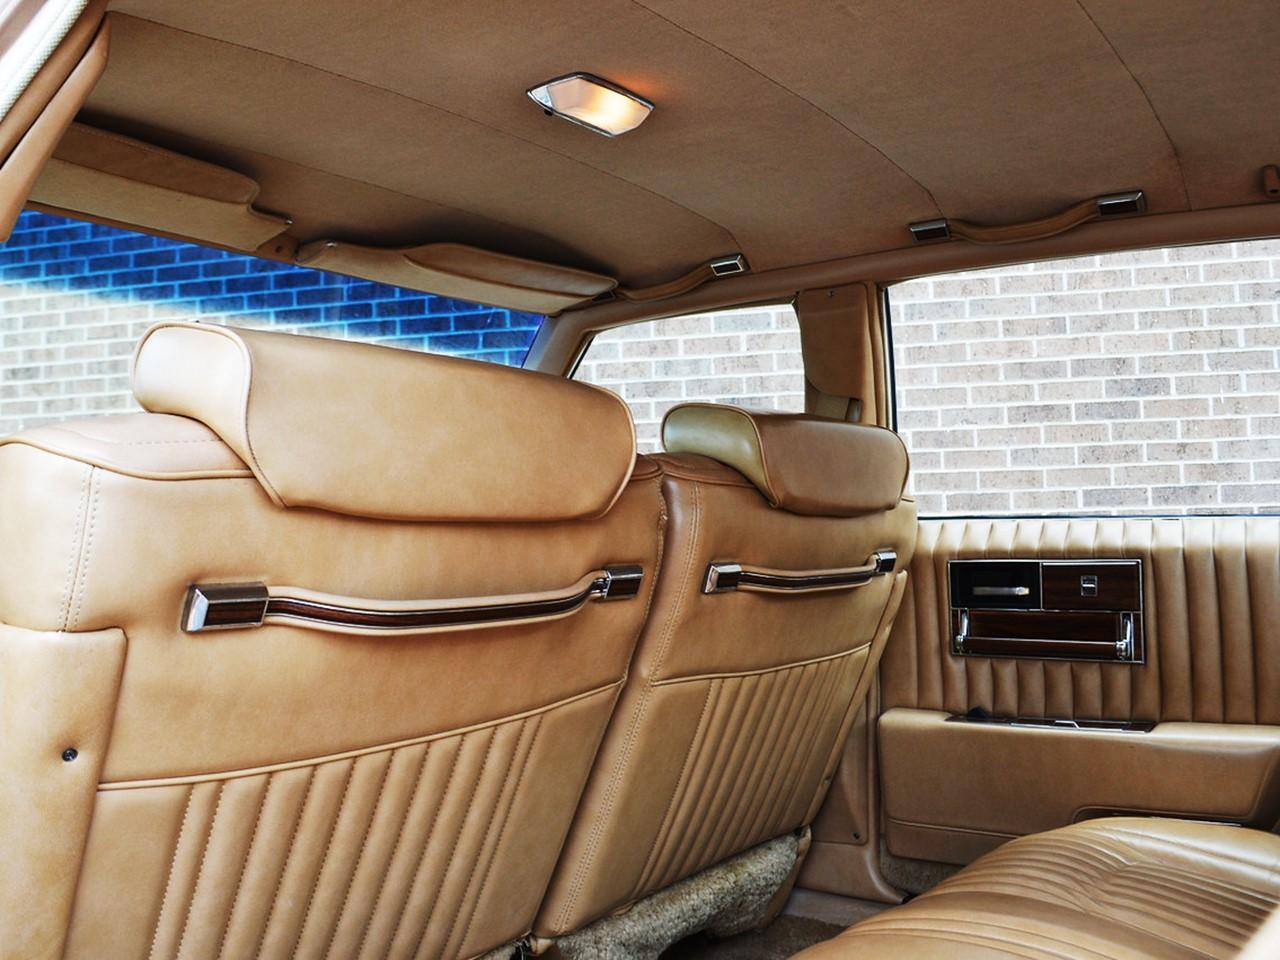 1976 Cadillac Seville 26